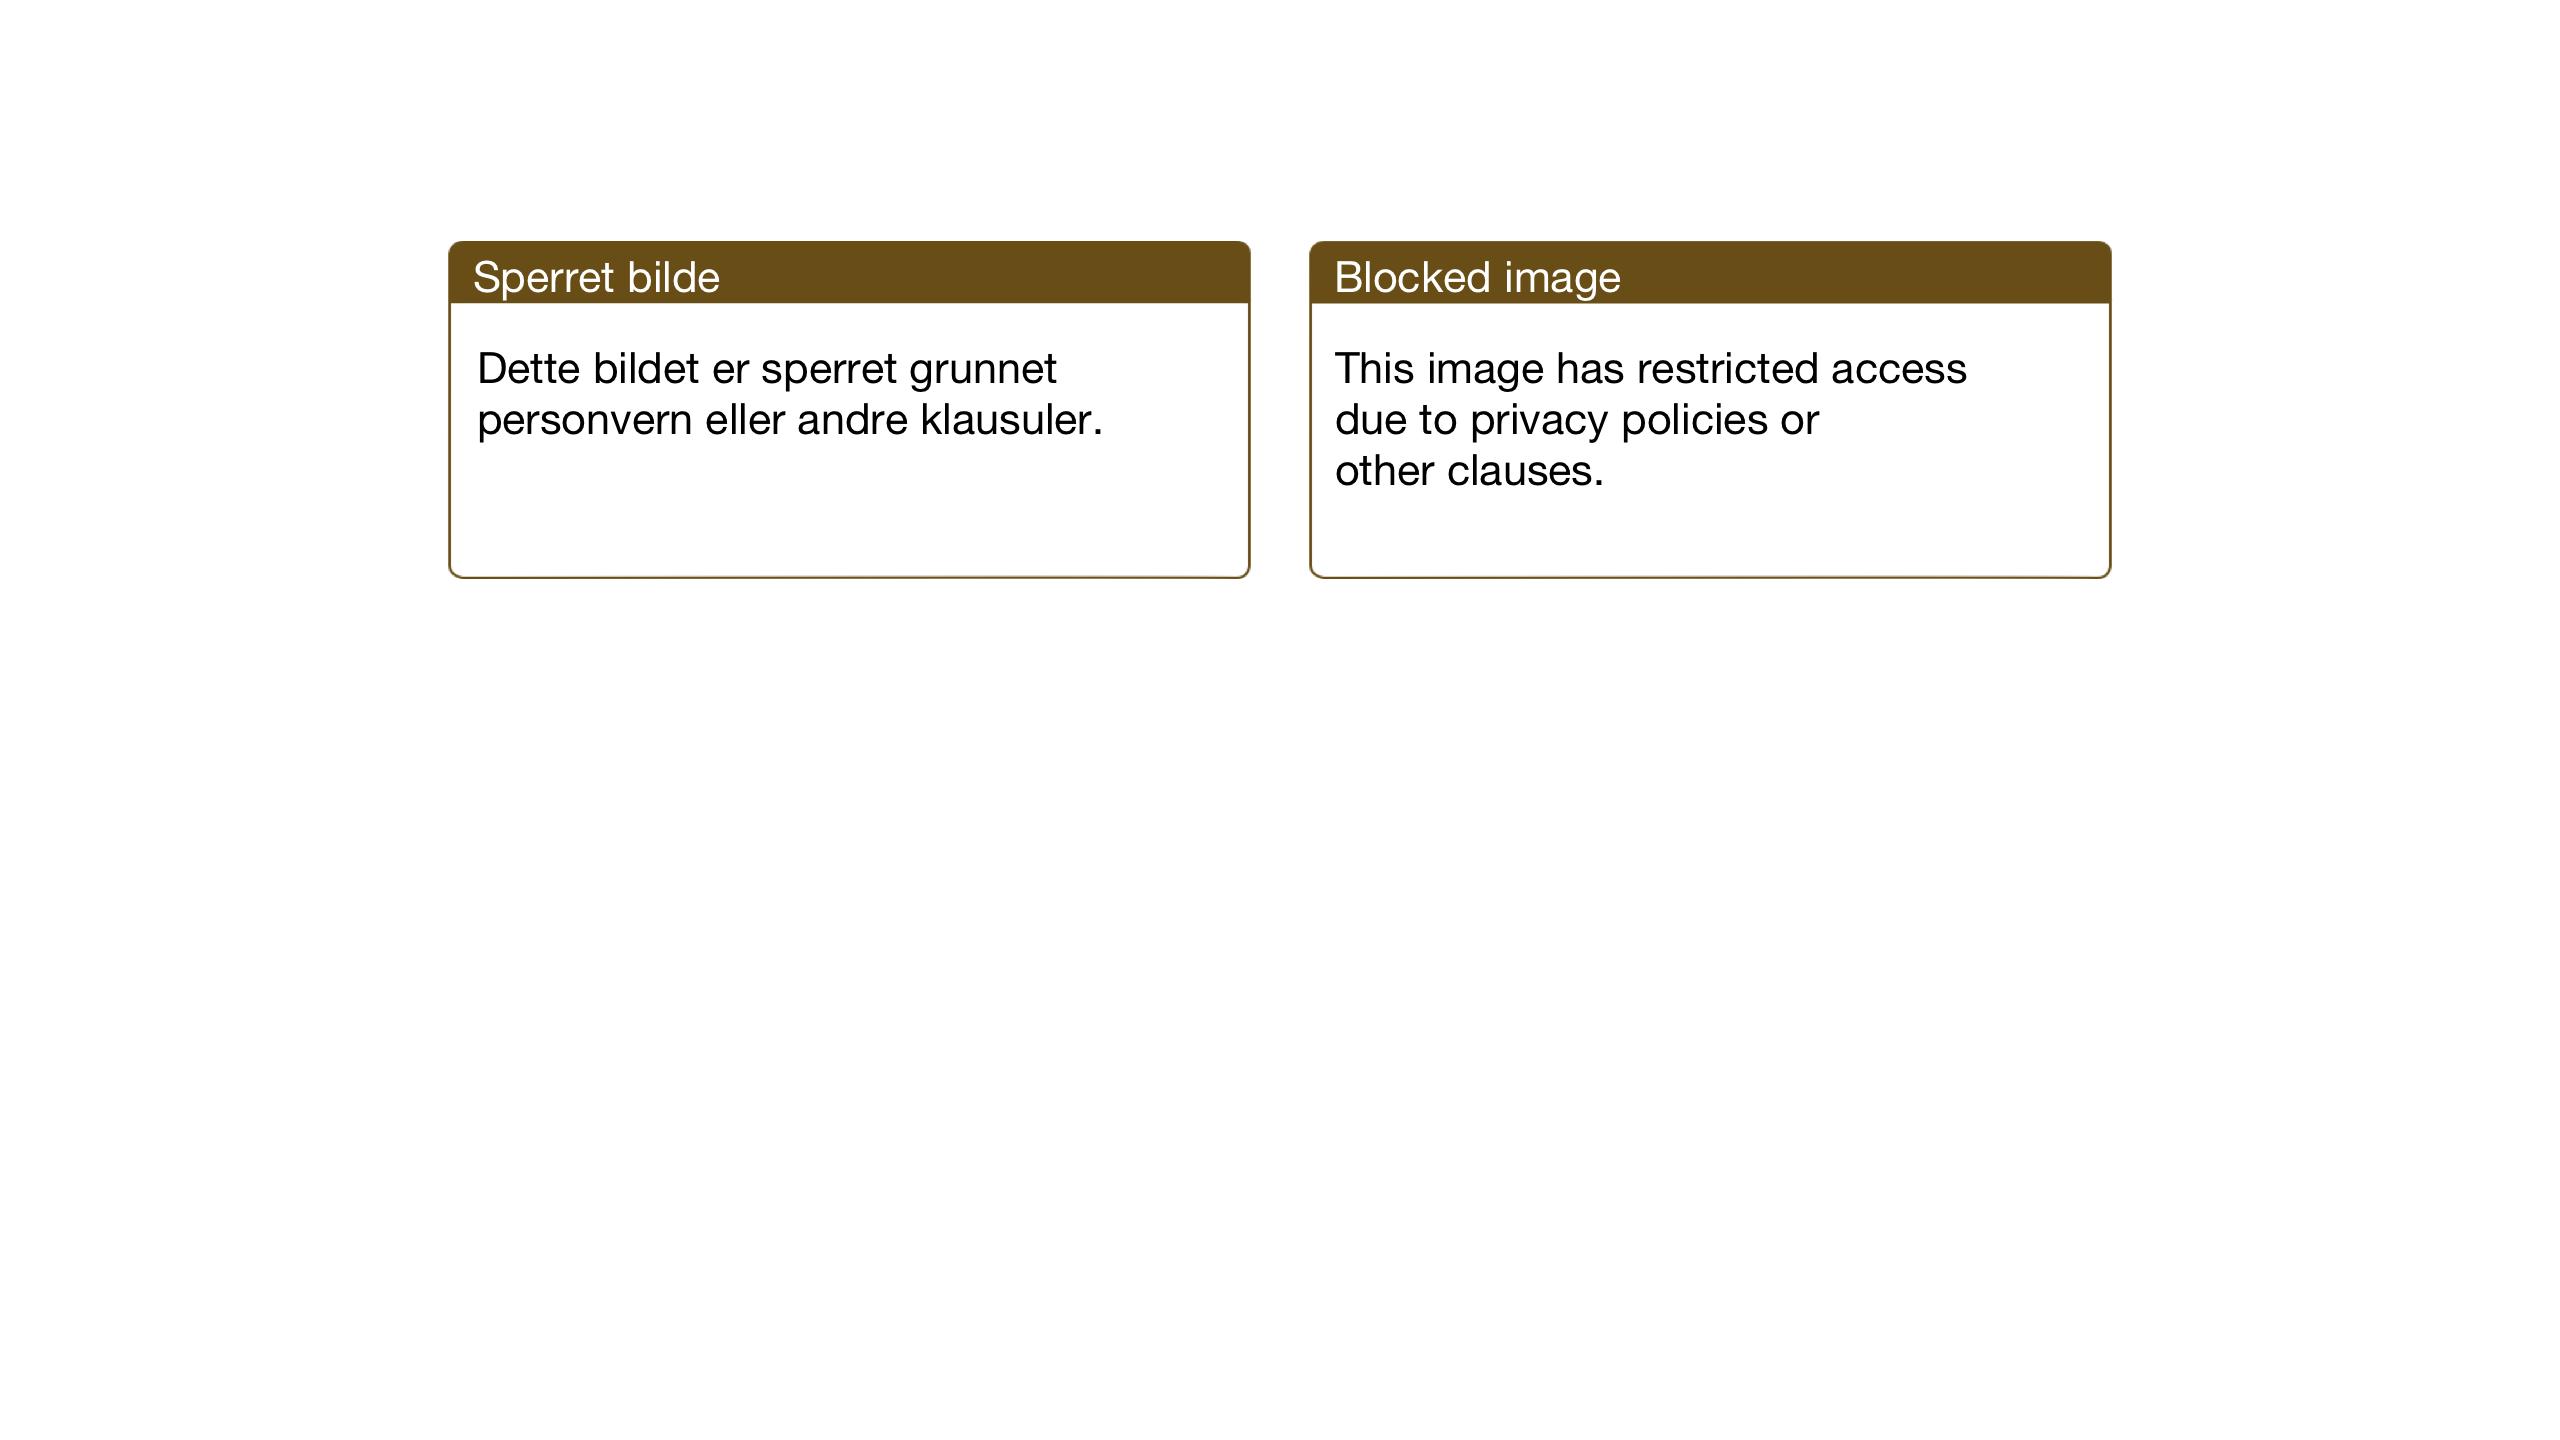 SAT, Ministerialprotokoller, klokkerbøker og fødselsregistre - Nordland, 847/L0680: Klokkerbok nr. 847C08, 1930-1947, s. 123